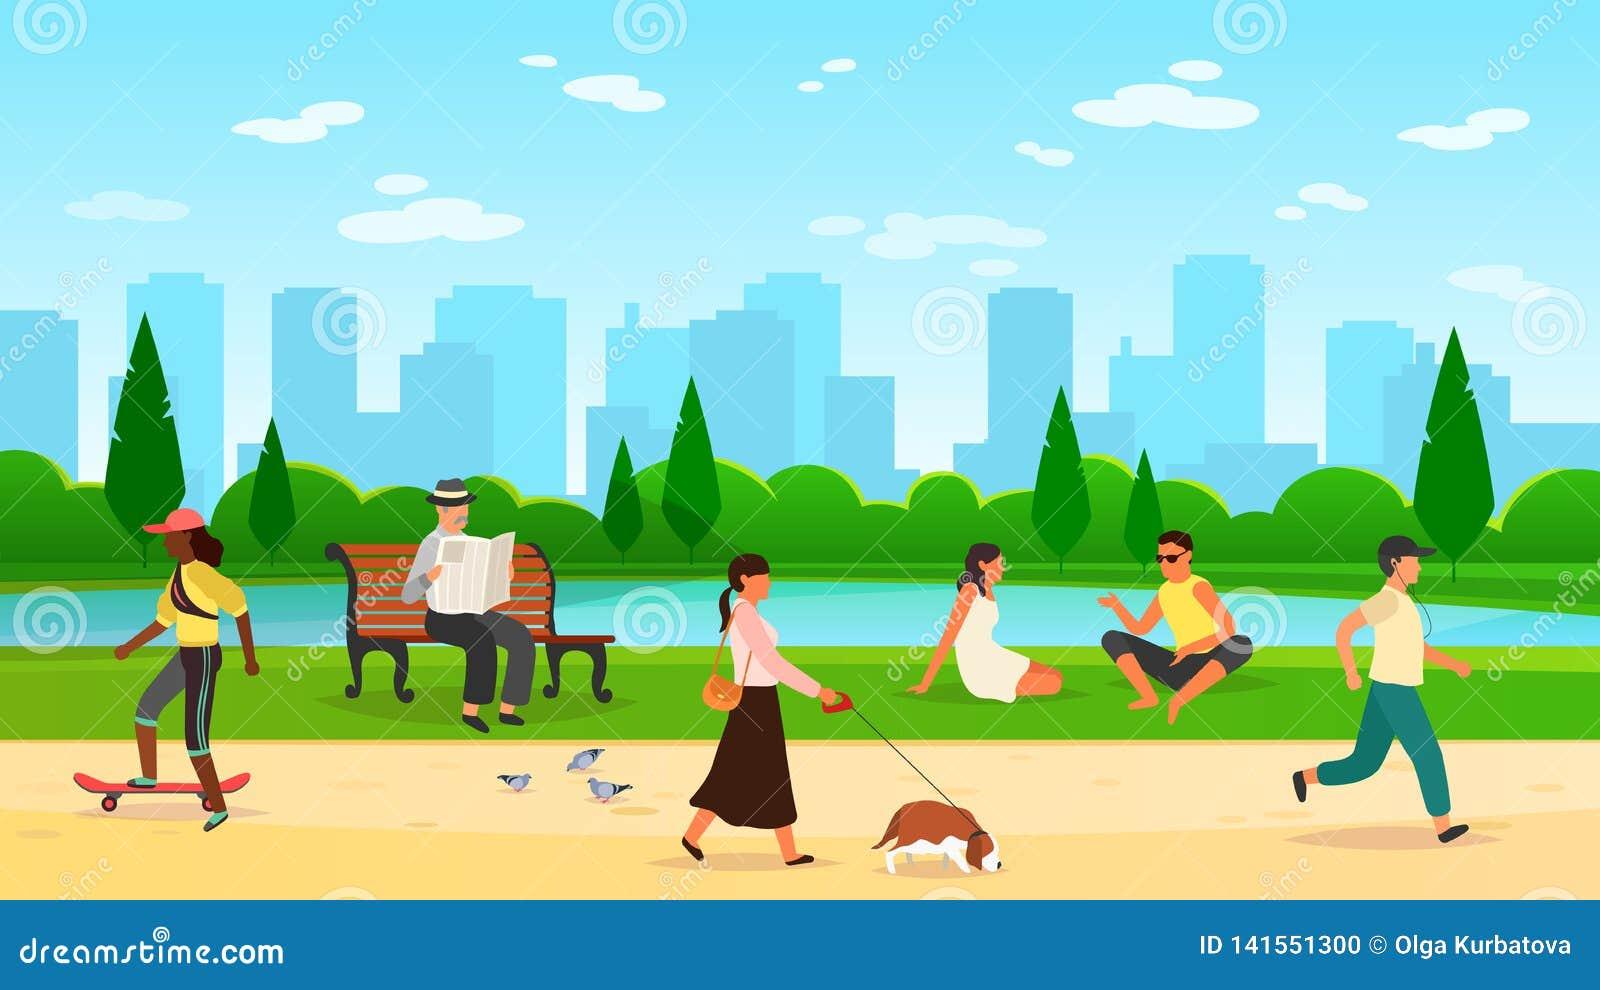 People walking park. Women men activity outdoors sport group running community fun walk nature cartoon lifestyle vector